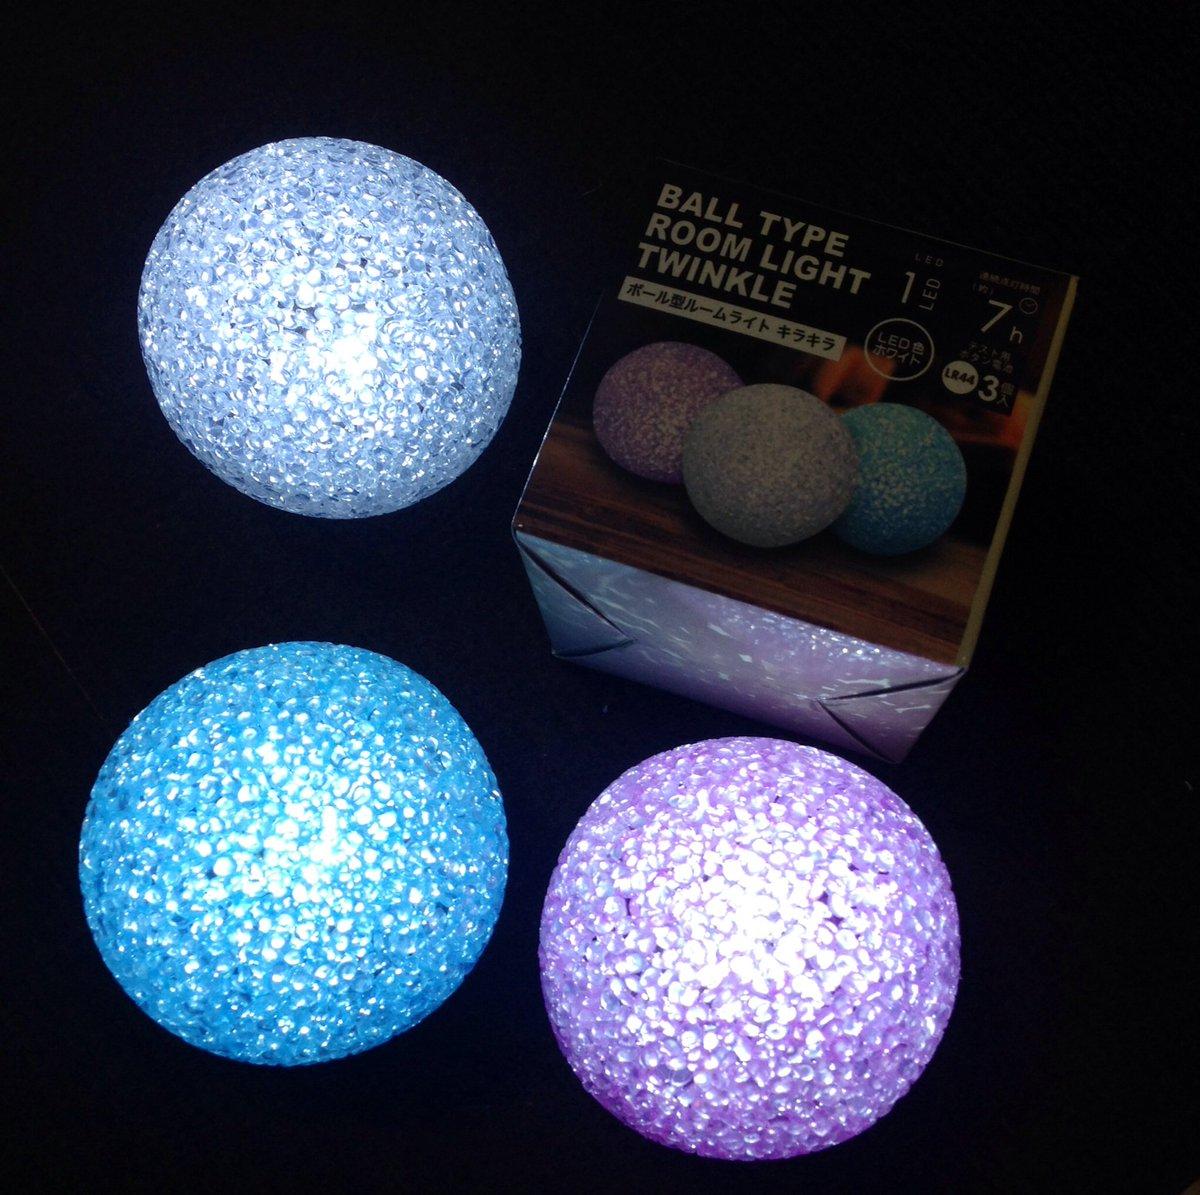 test ツイッターメディア - セリアのボール型ルームライトが可愛いくてキレイ!100円には見えない^^  #セリア https://t.co/FB9tEQoX6J